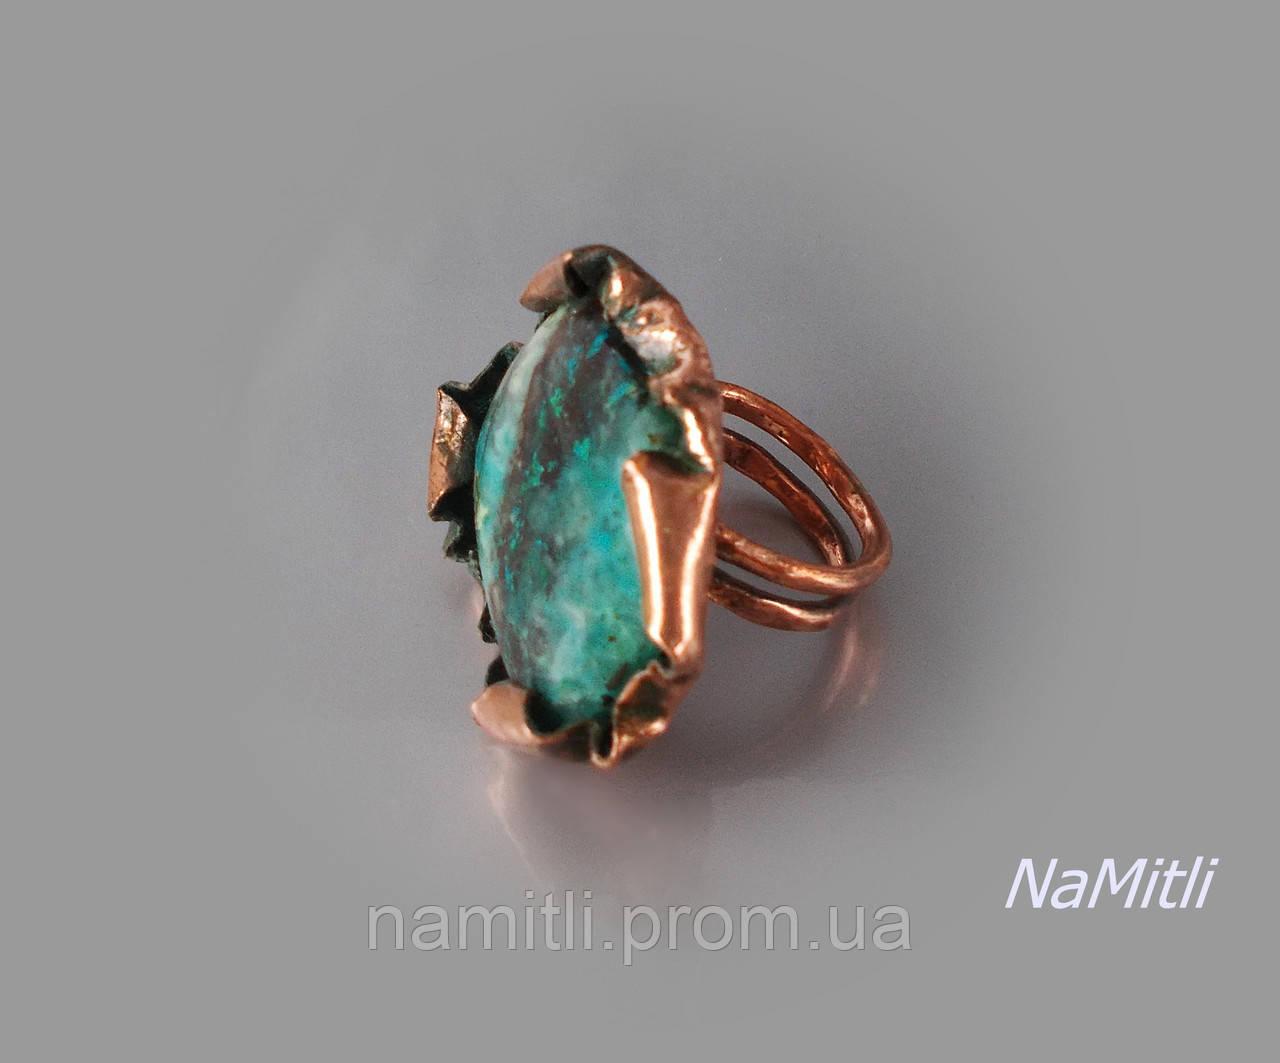 Мідна каблучка з великим каменем Хризоколла - Namitli в Виннице